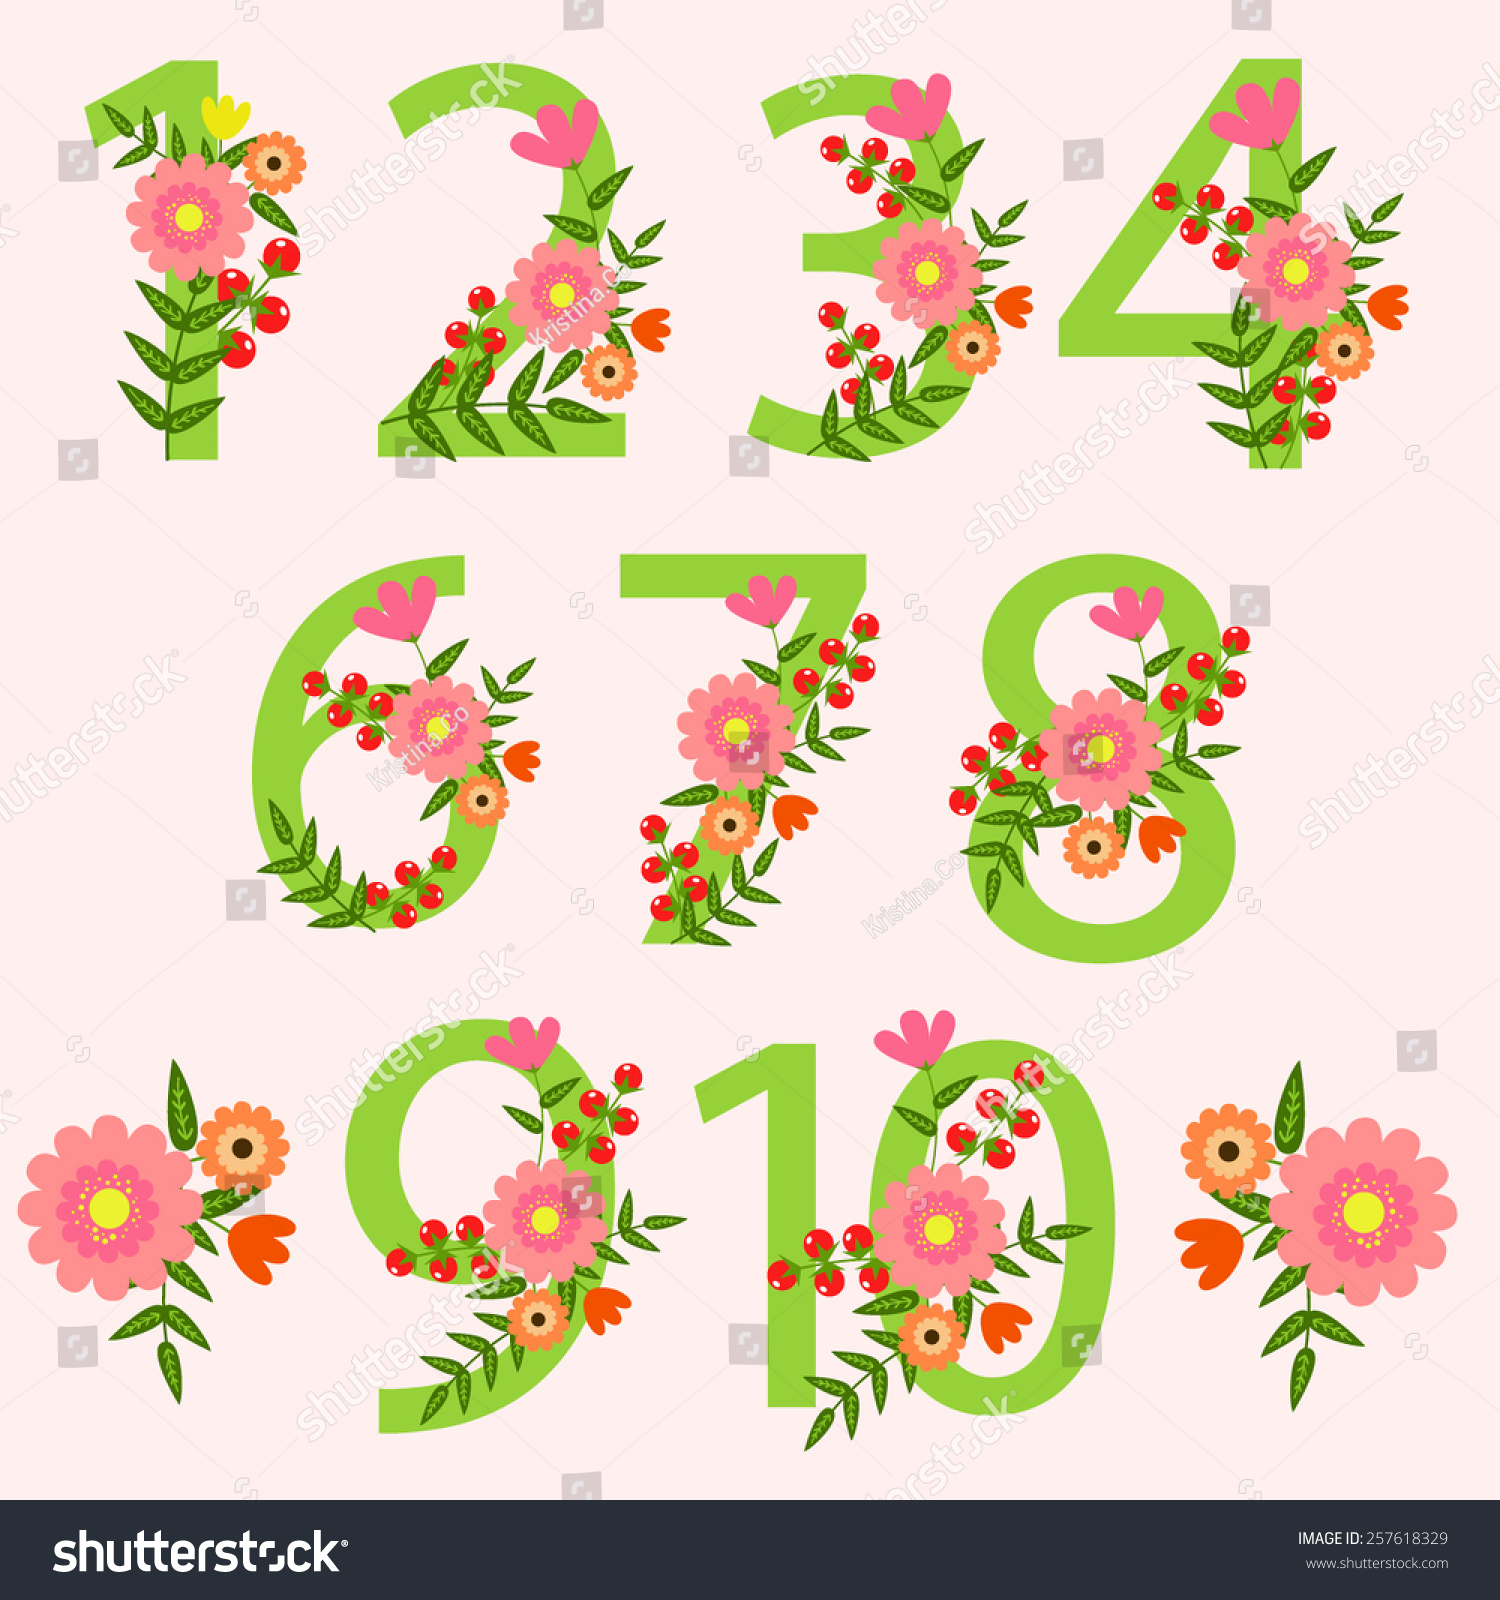 hight resolution of wedding floral number wedding clipart wedding invitations scrapbooking design blog